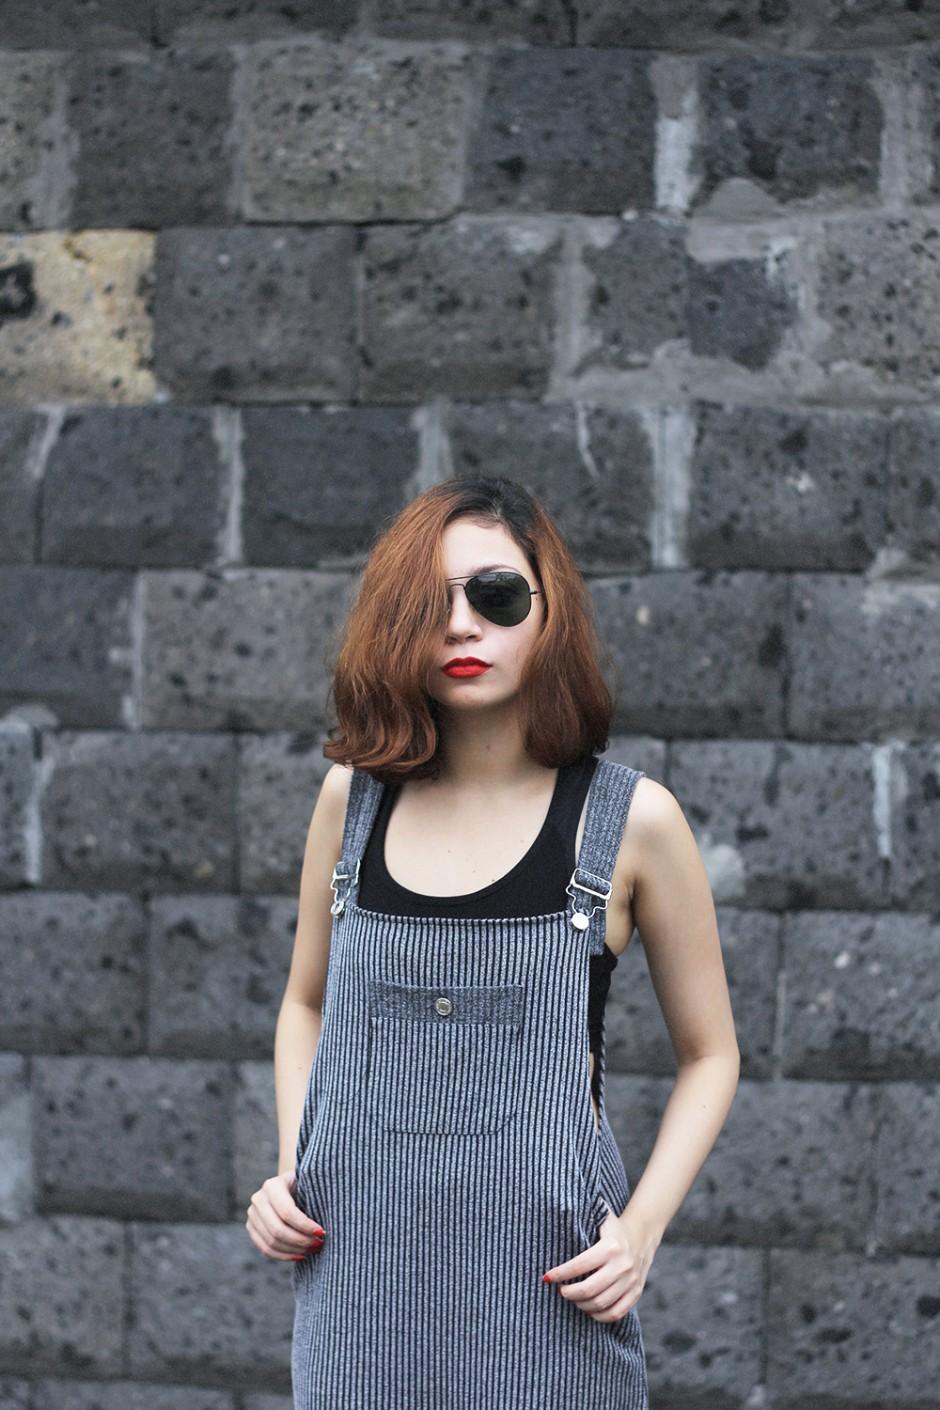 overalls-alyssa-blogger-street-style3a